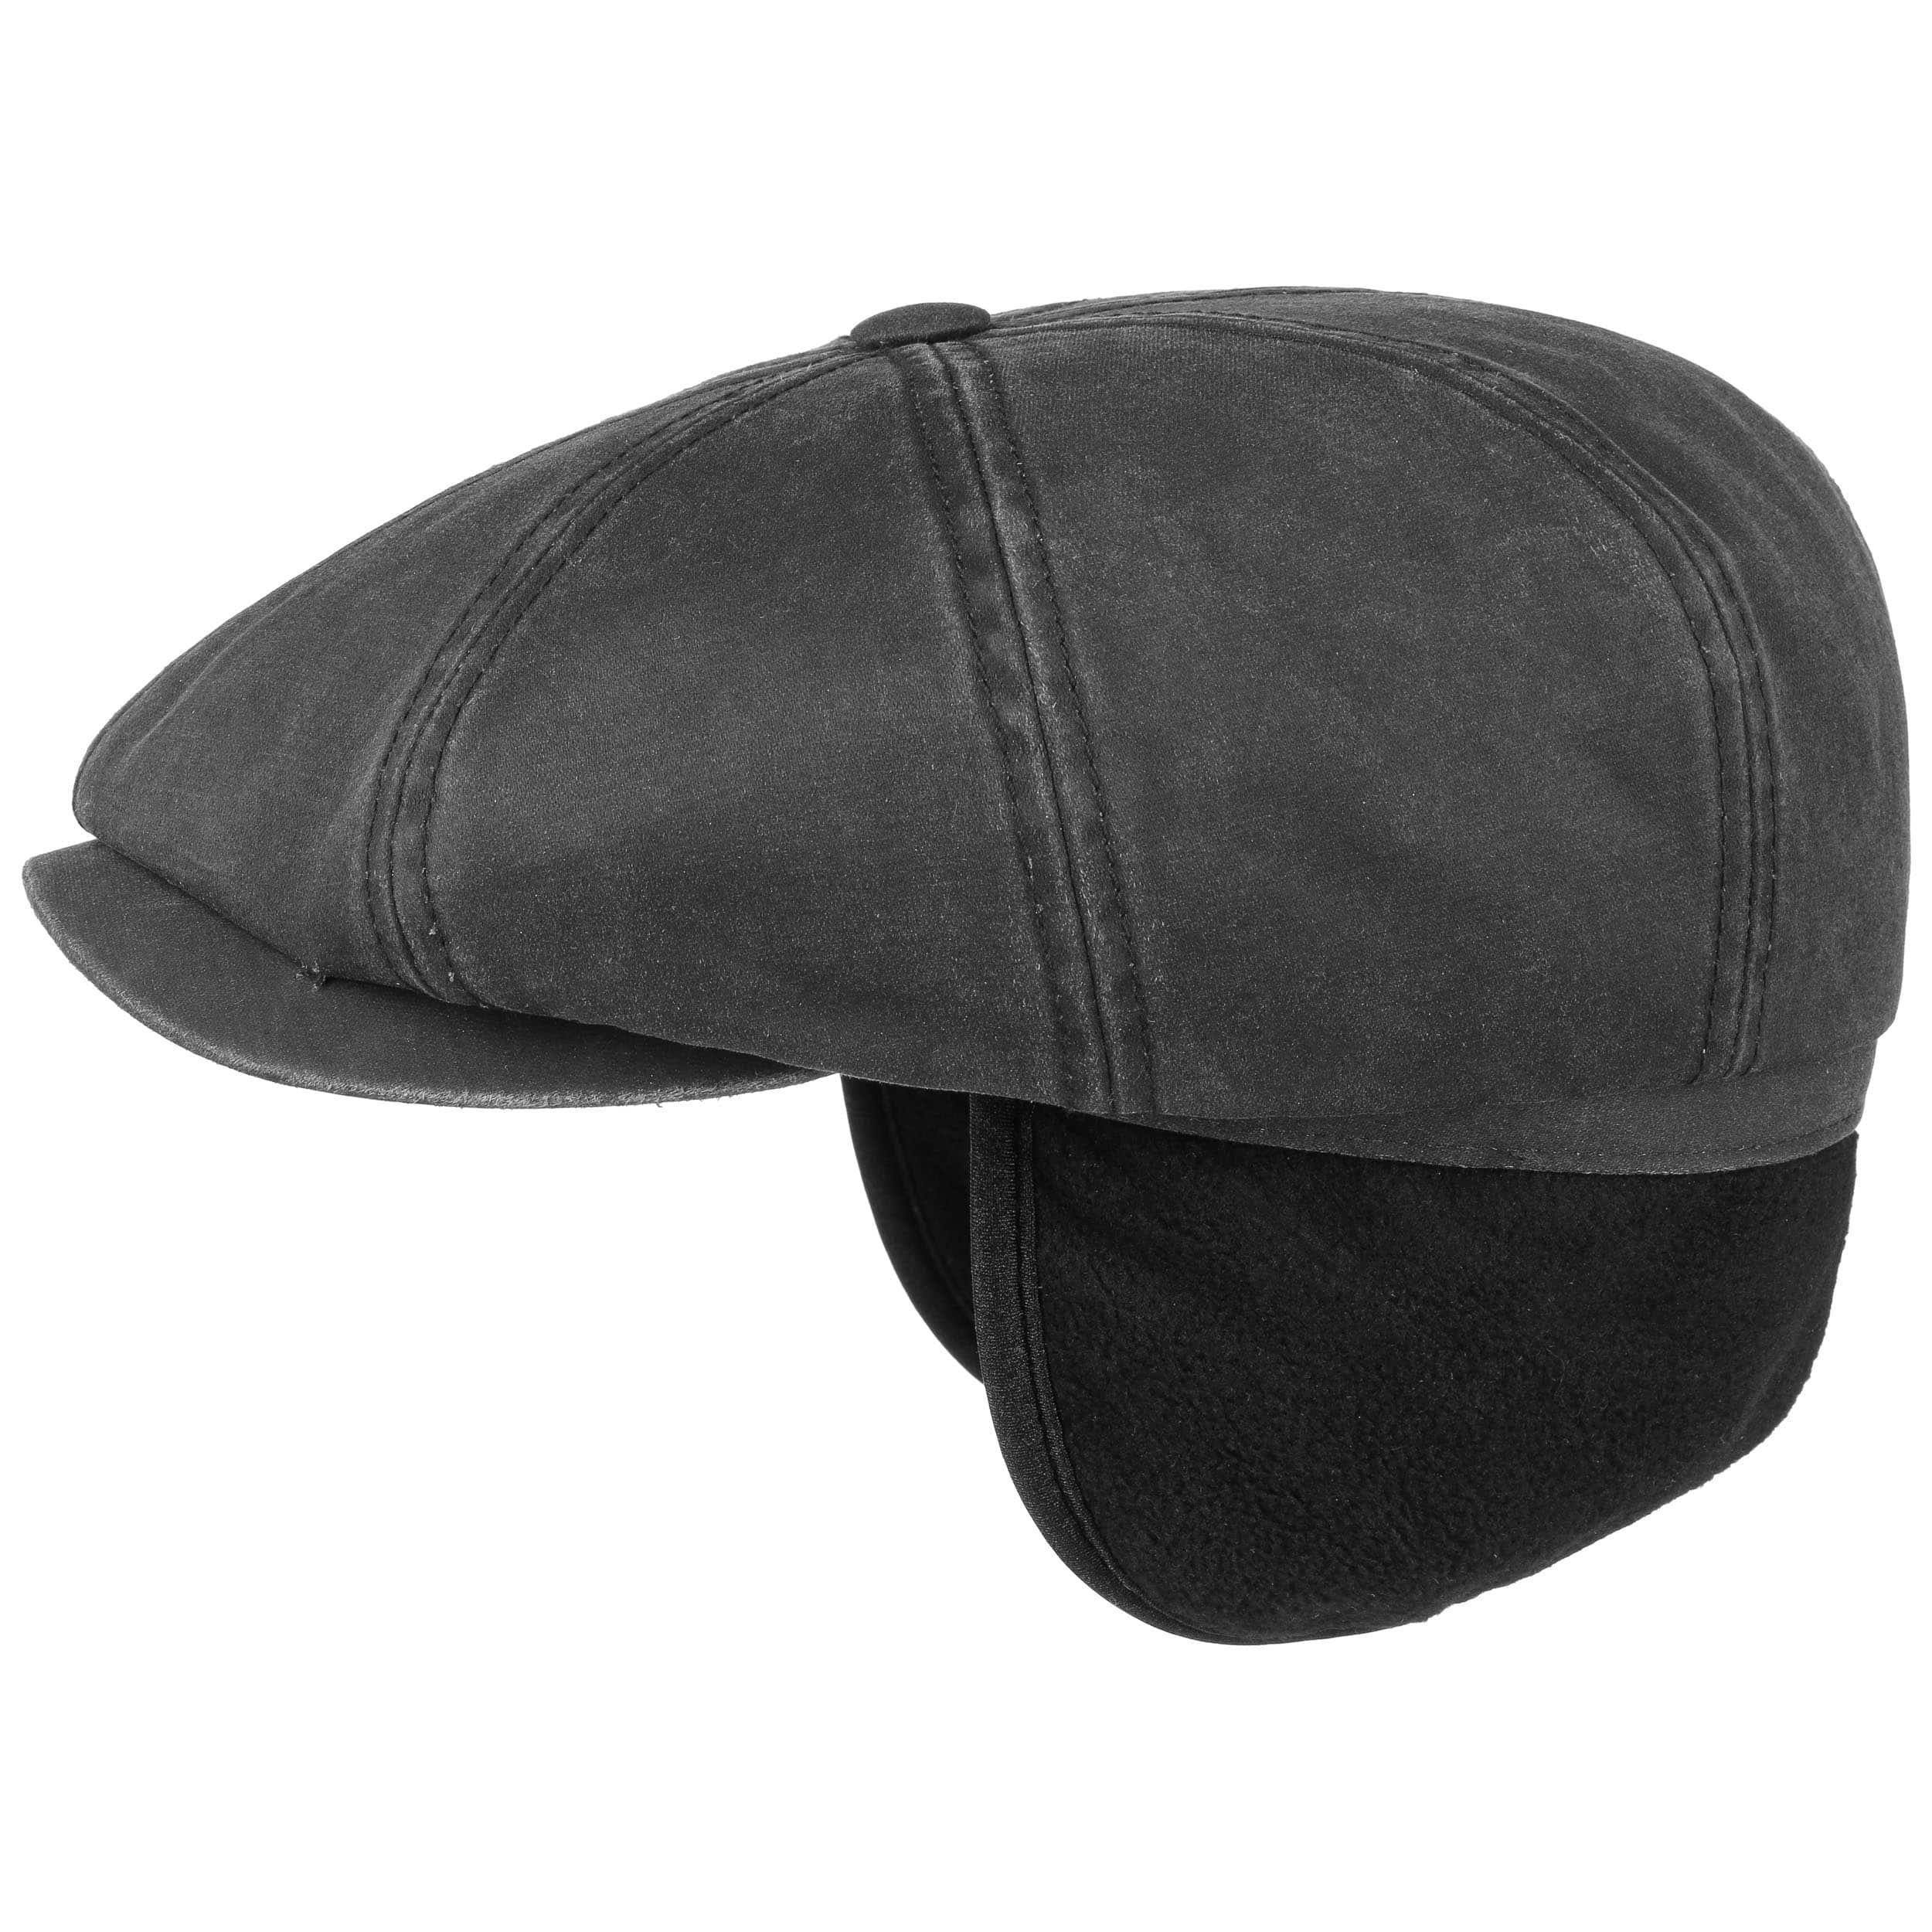 ... marrone 2 · Coppola Hatteras Old Cotton Ear Flap by Stetson - nero 2 a95427a26b27